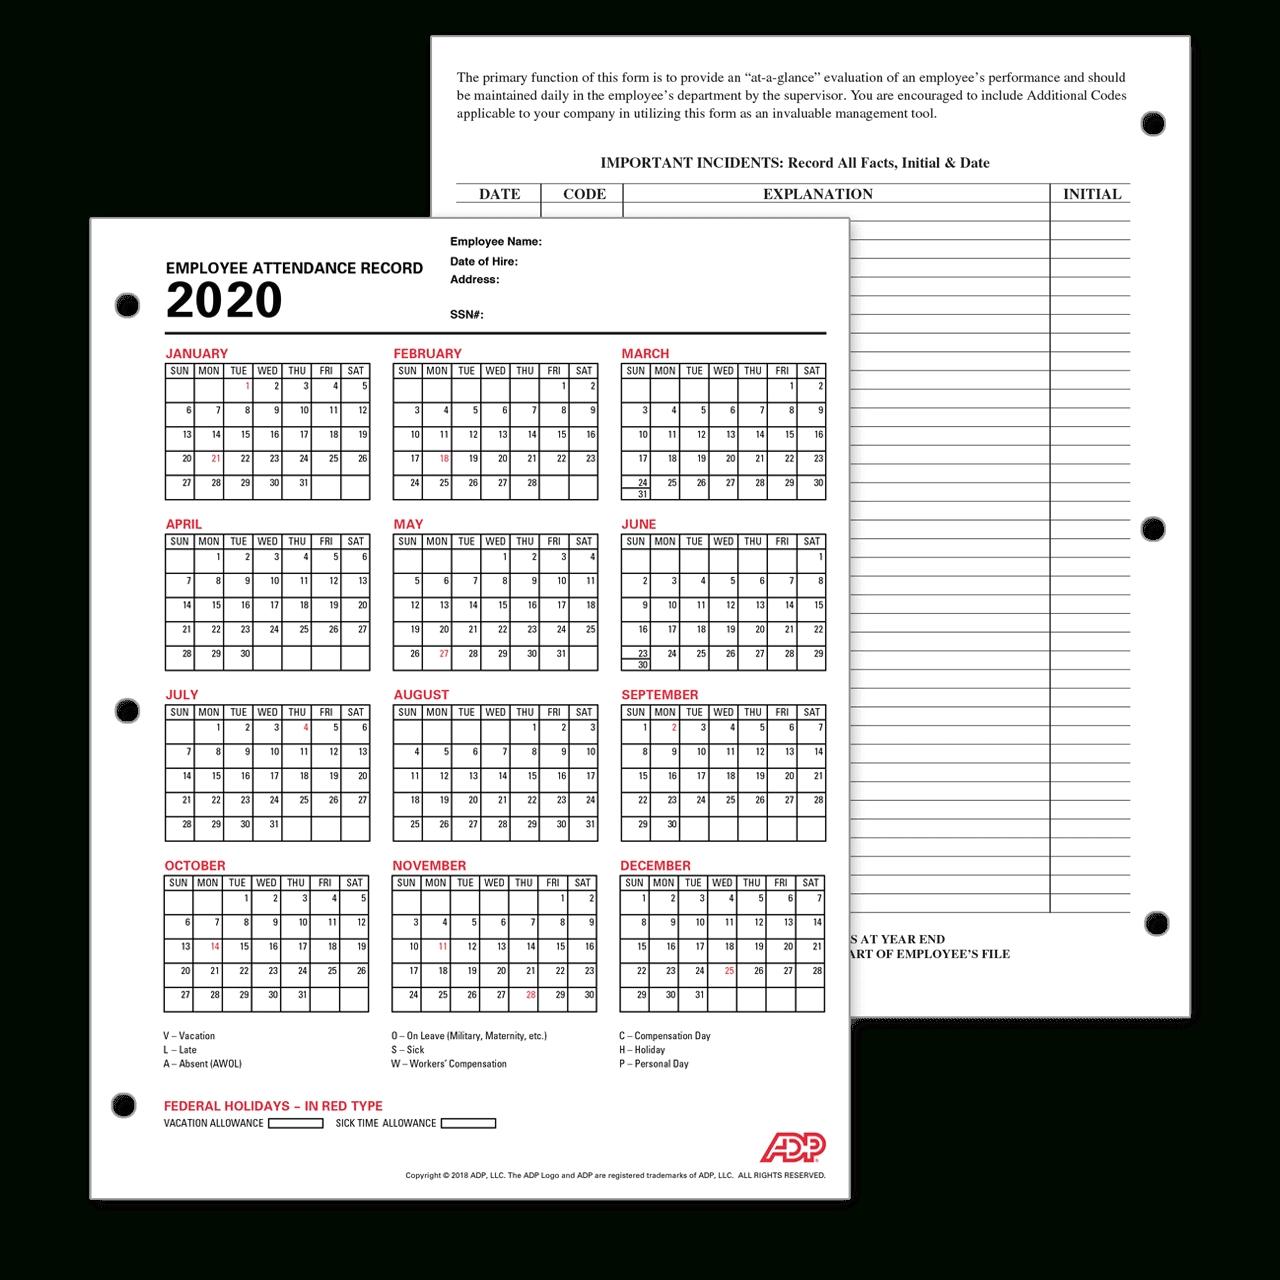 Adp Employee Attendance Record / Calendar for Employeee Attendance Calendar For 2020